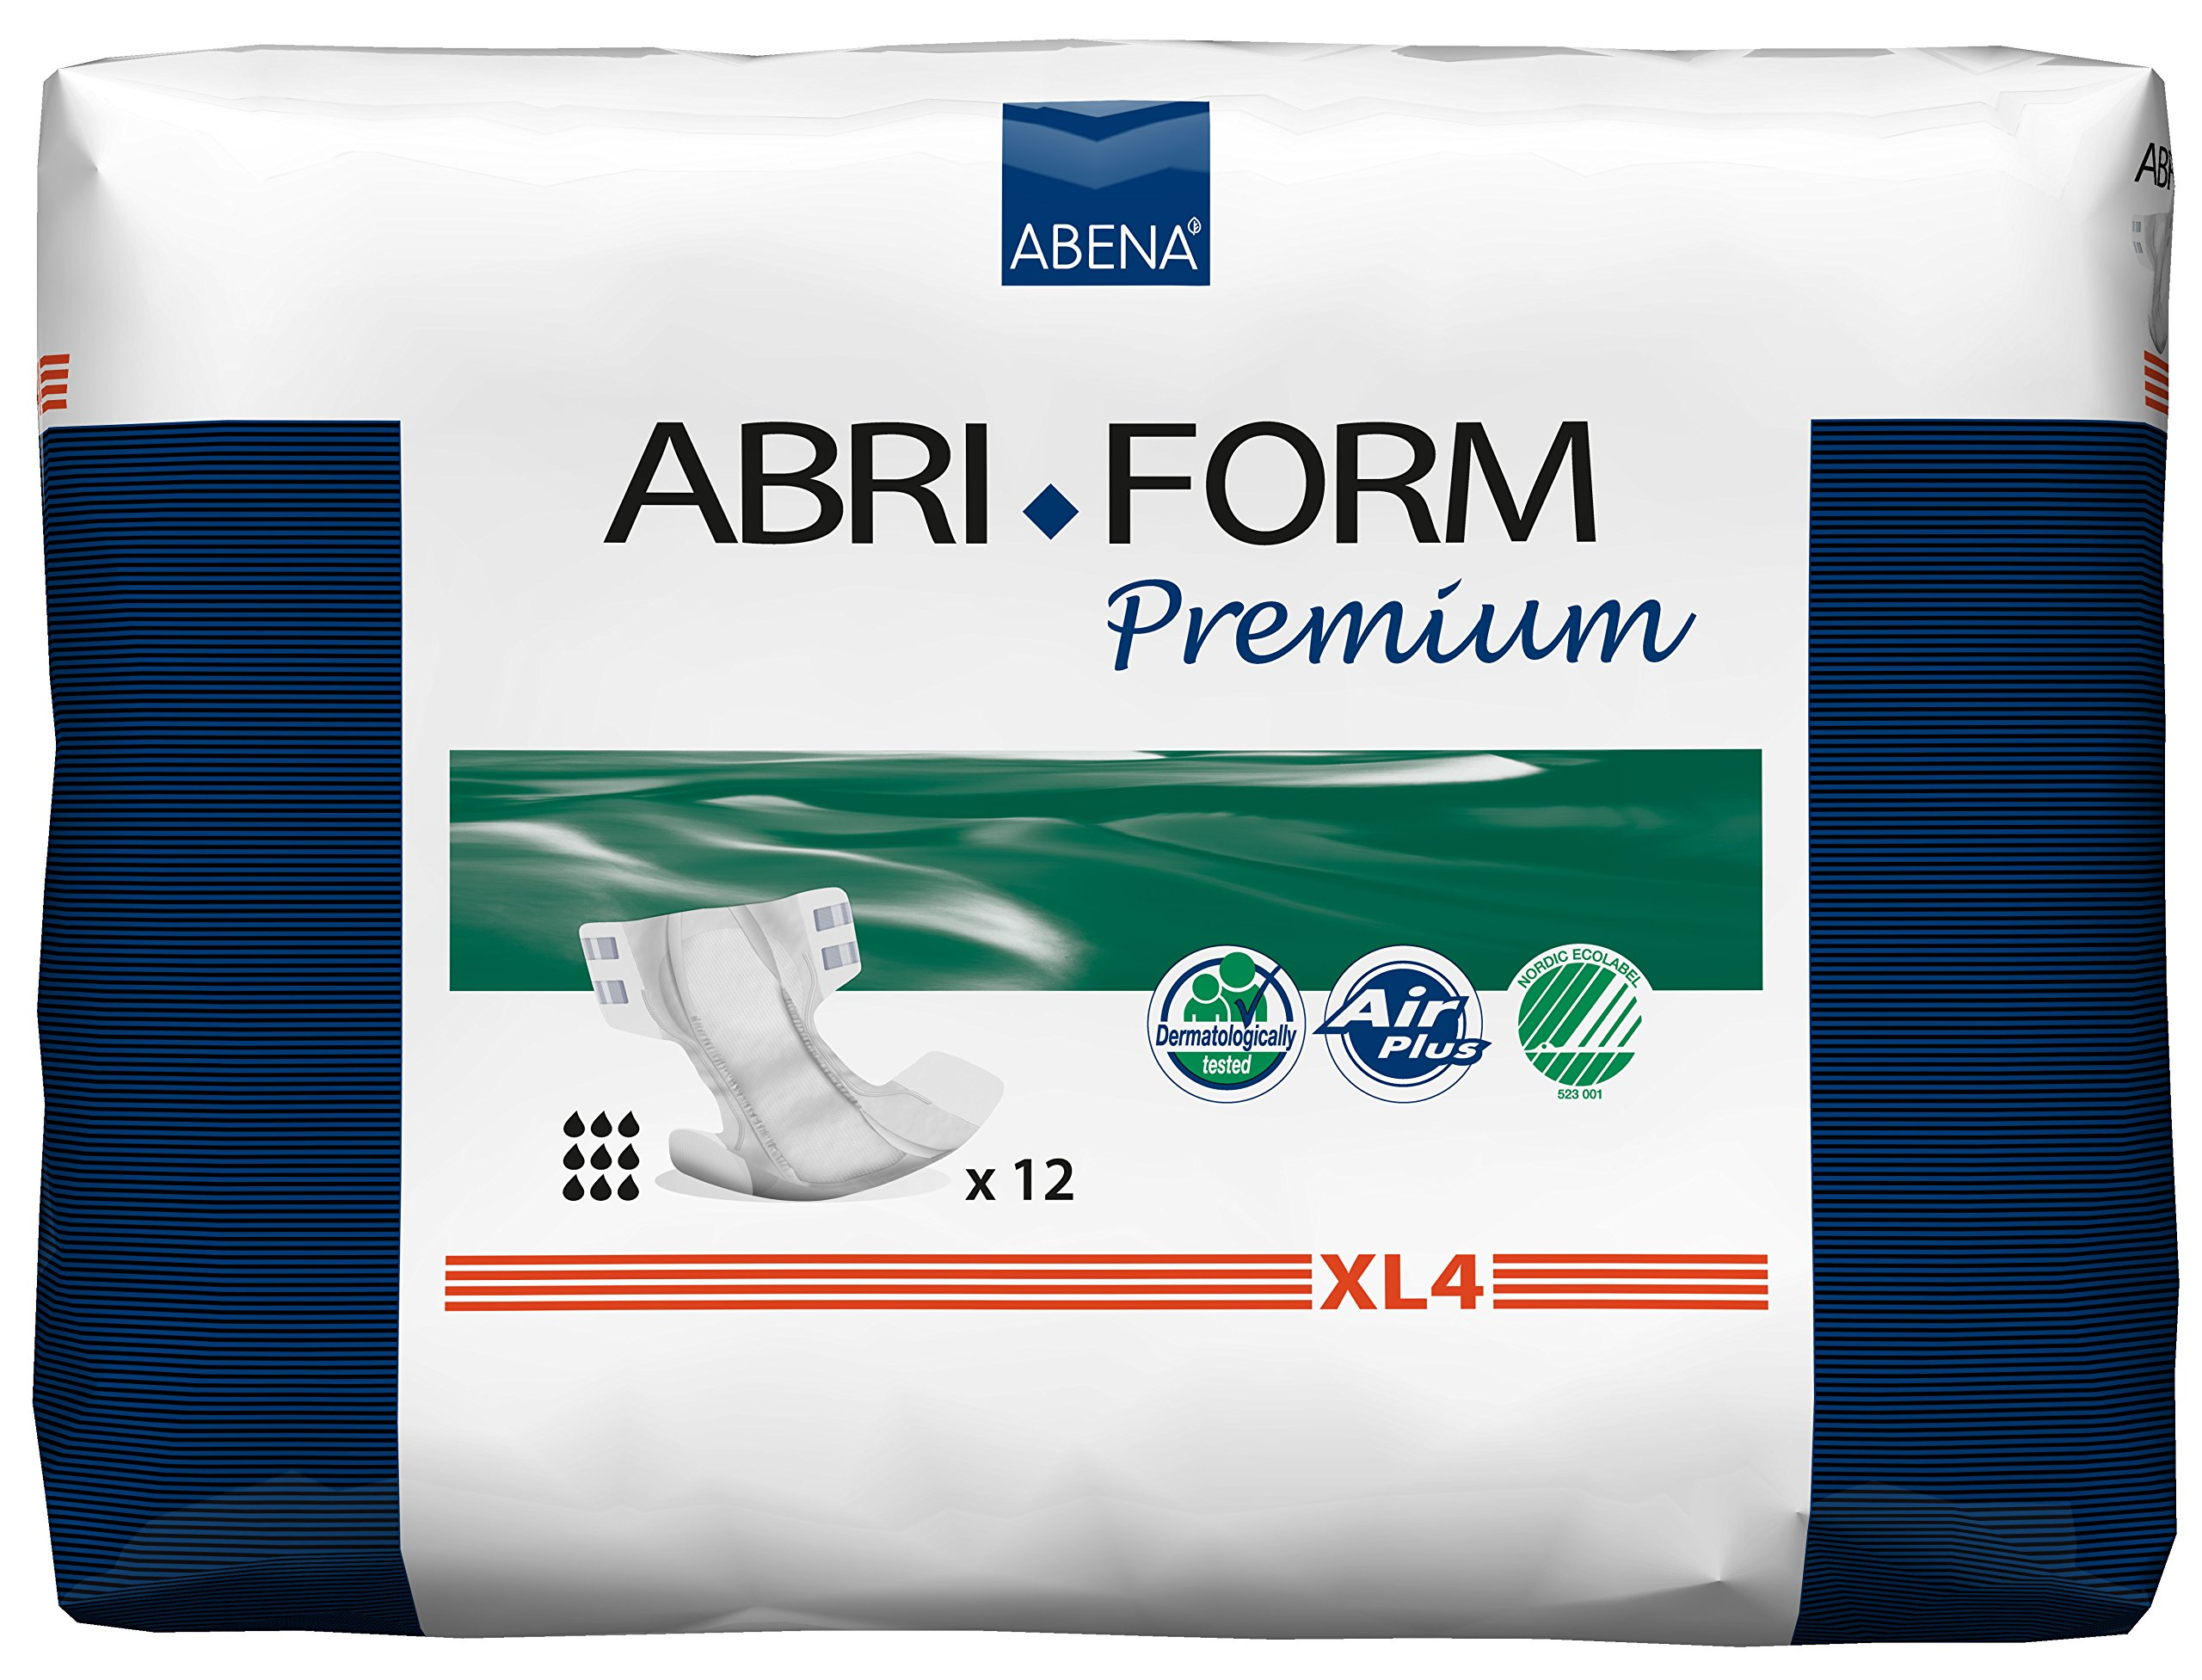 Abena Abri-Form Premium Incontinence Briefs, Extra Large, XL4, 12 Count